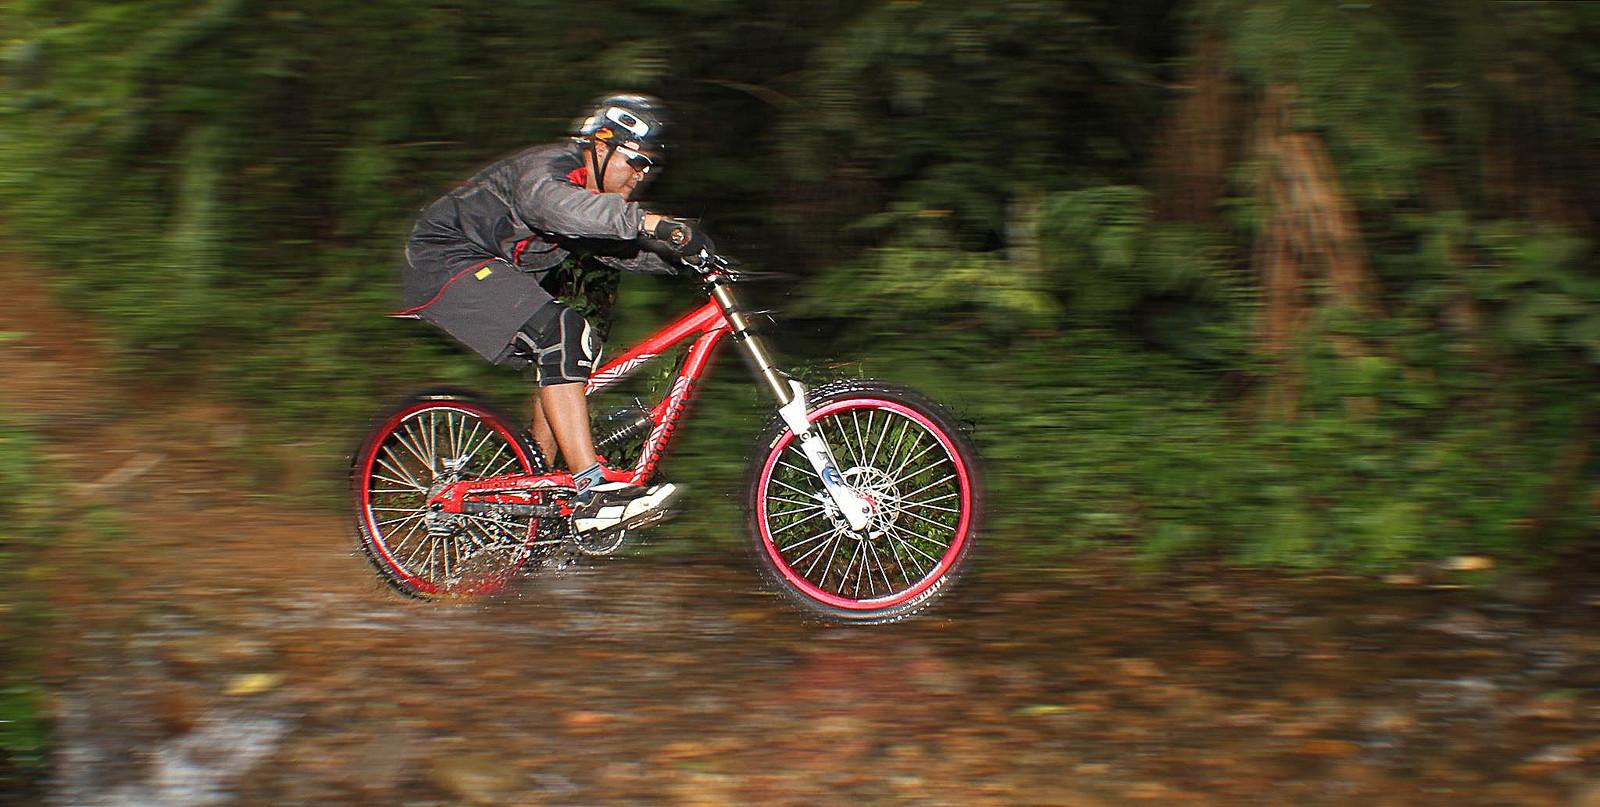 comencal - budi - Mountain Biking Pictures - Vital MTB